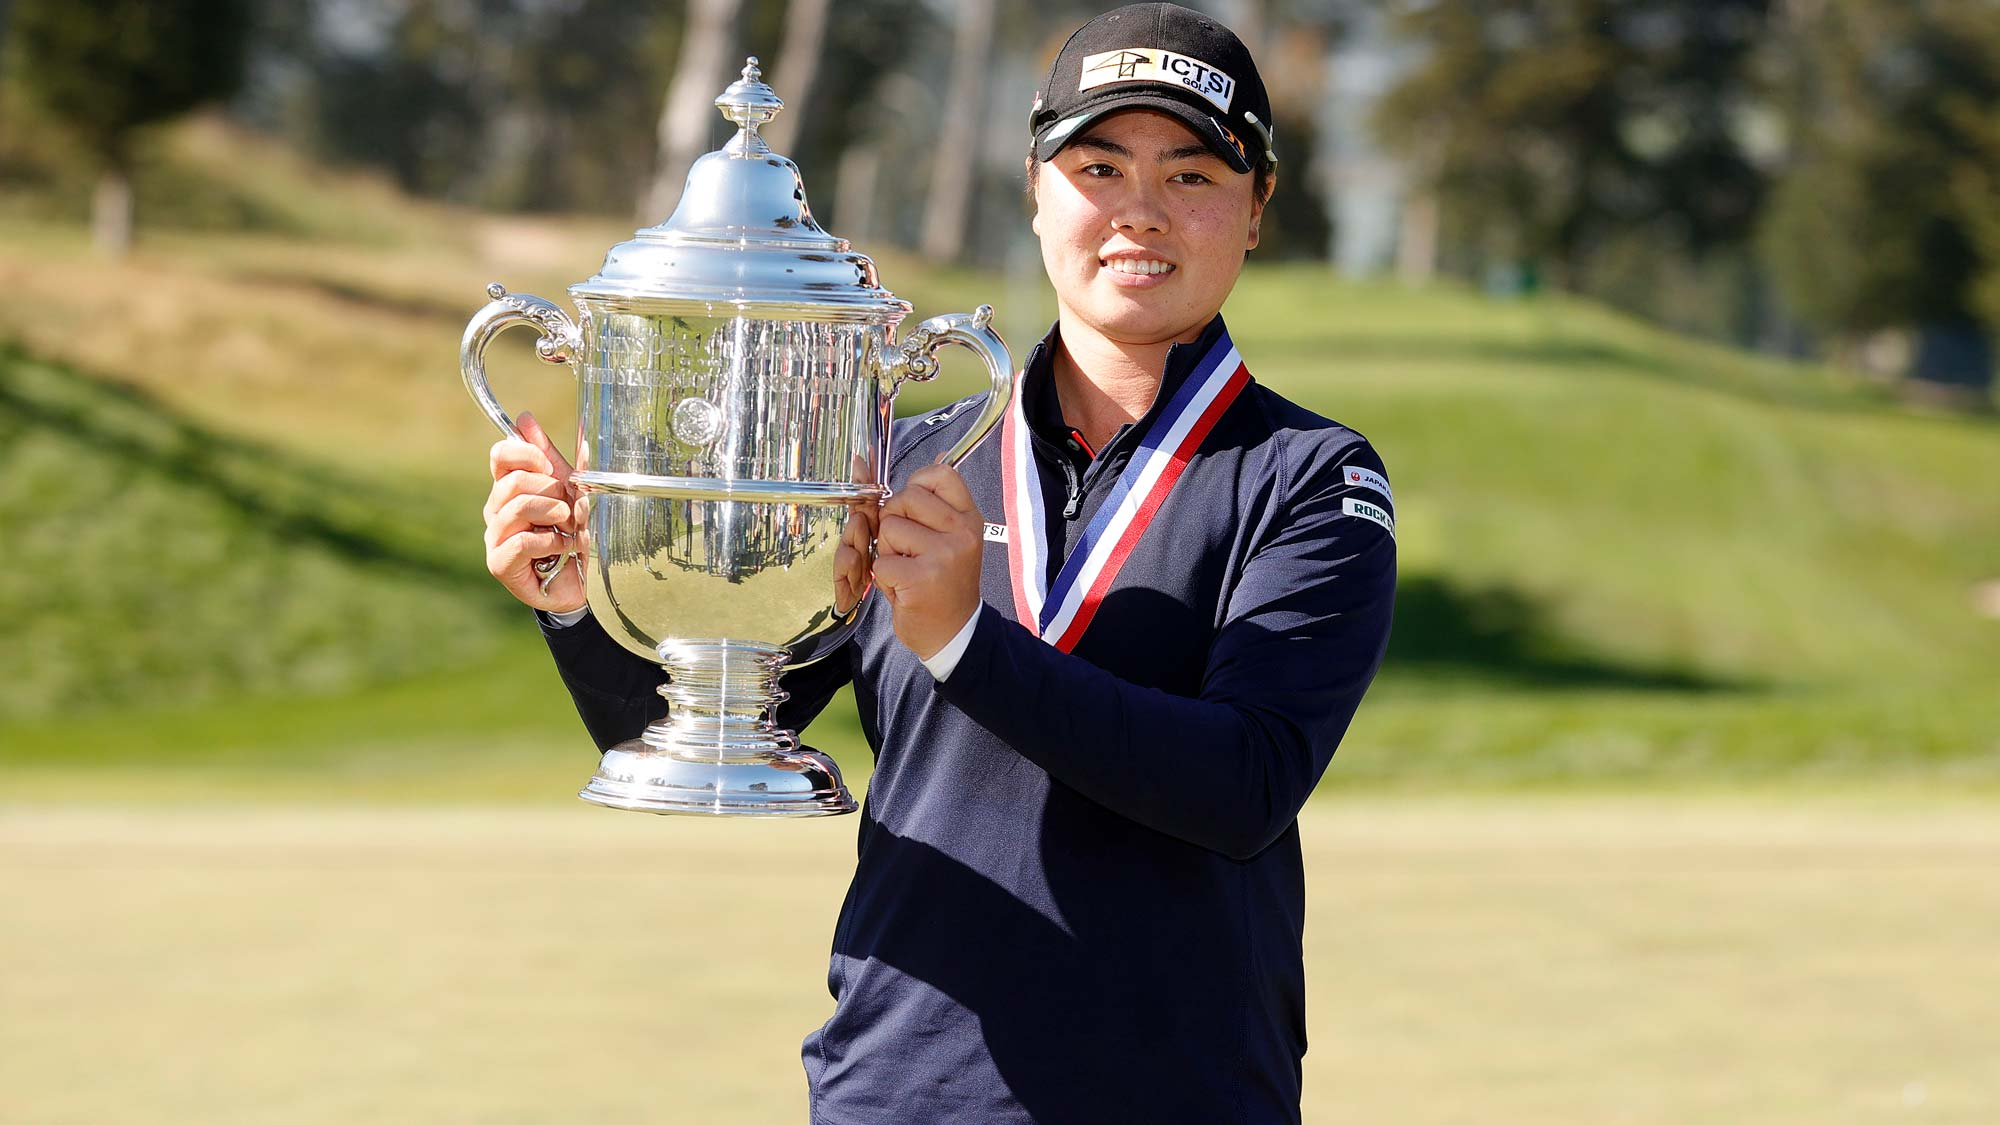 Yuka Saso Wins Us Womens Open On 3rd Playoff Hole Lpga Ladies Professional Golf Association